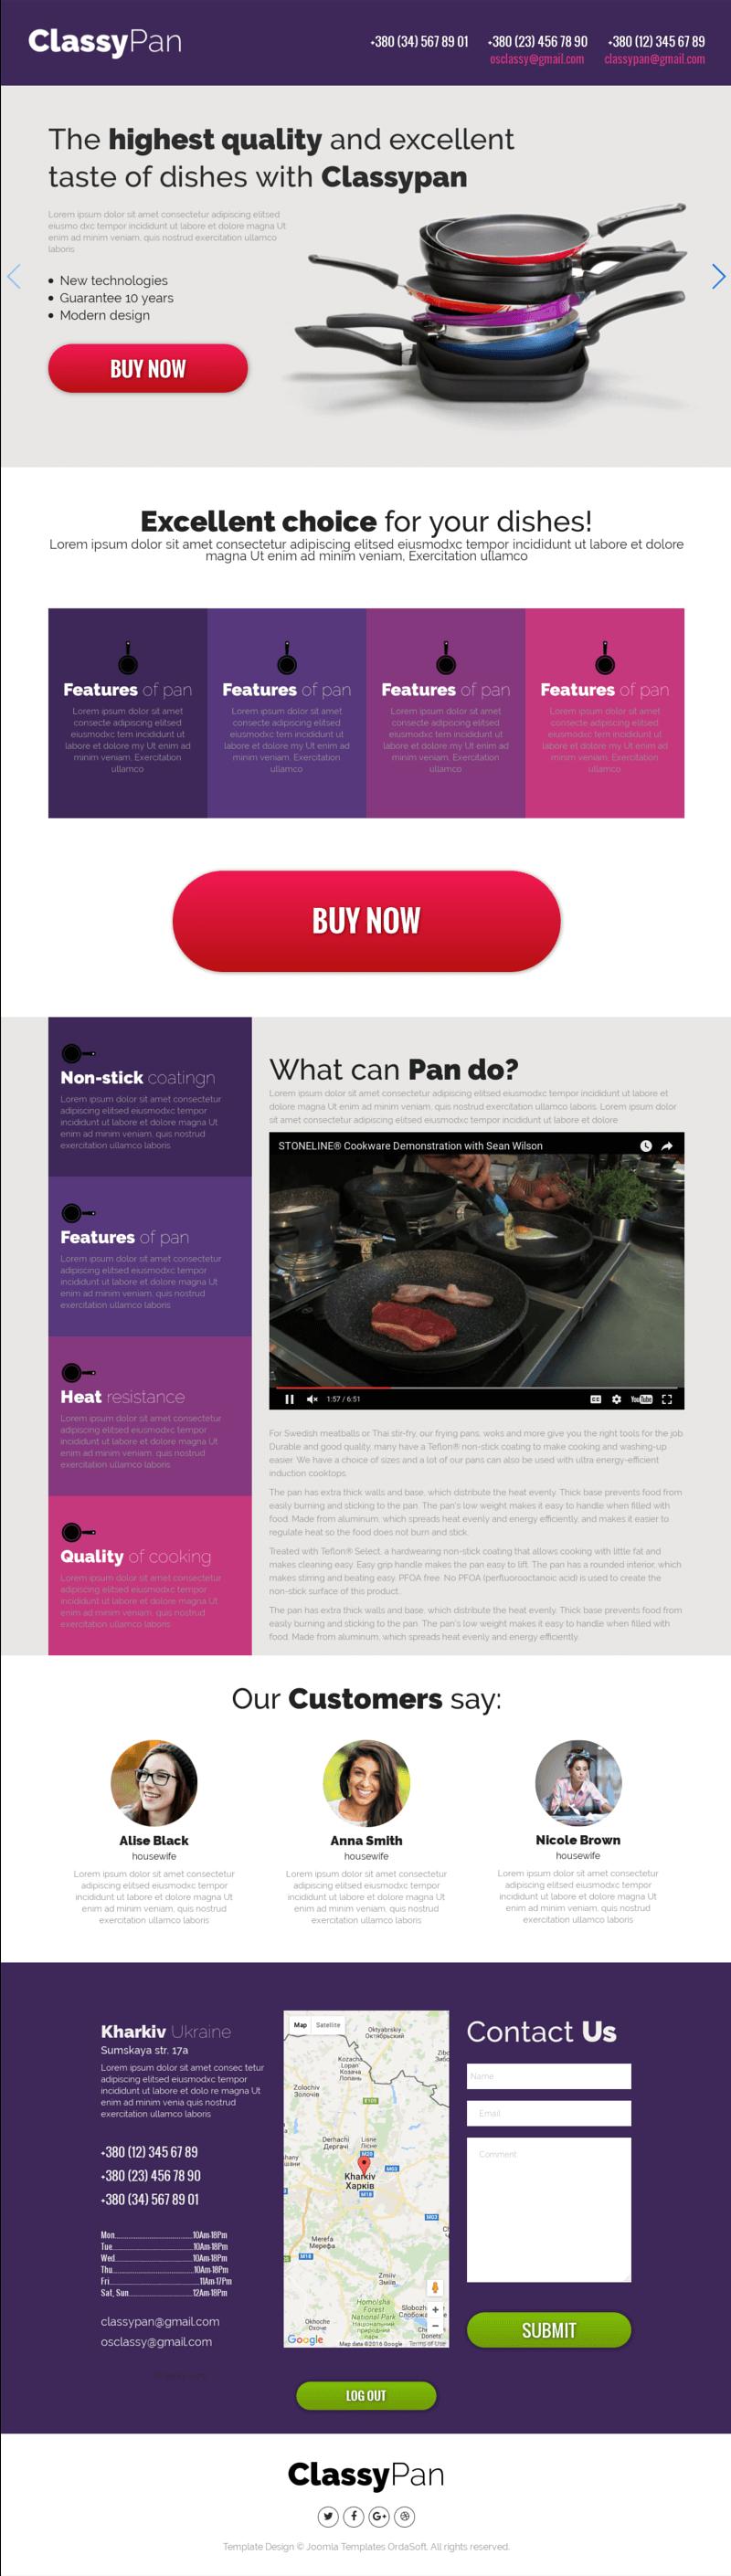 Classy Pan Joomla Landing Page Template Joomla Business - Single page landing page template